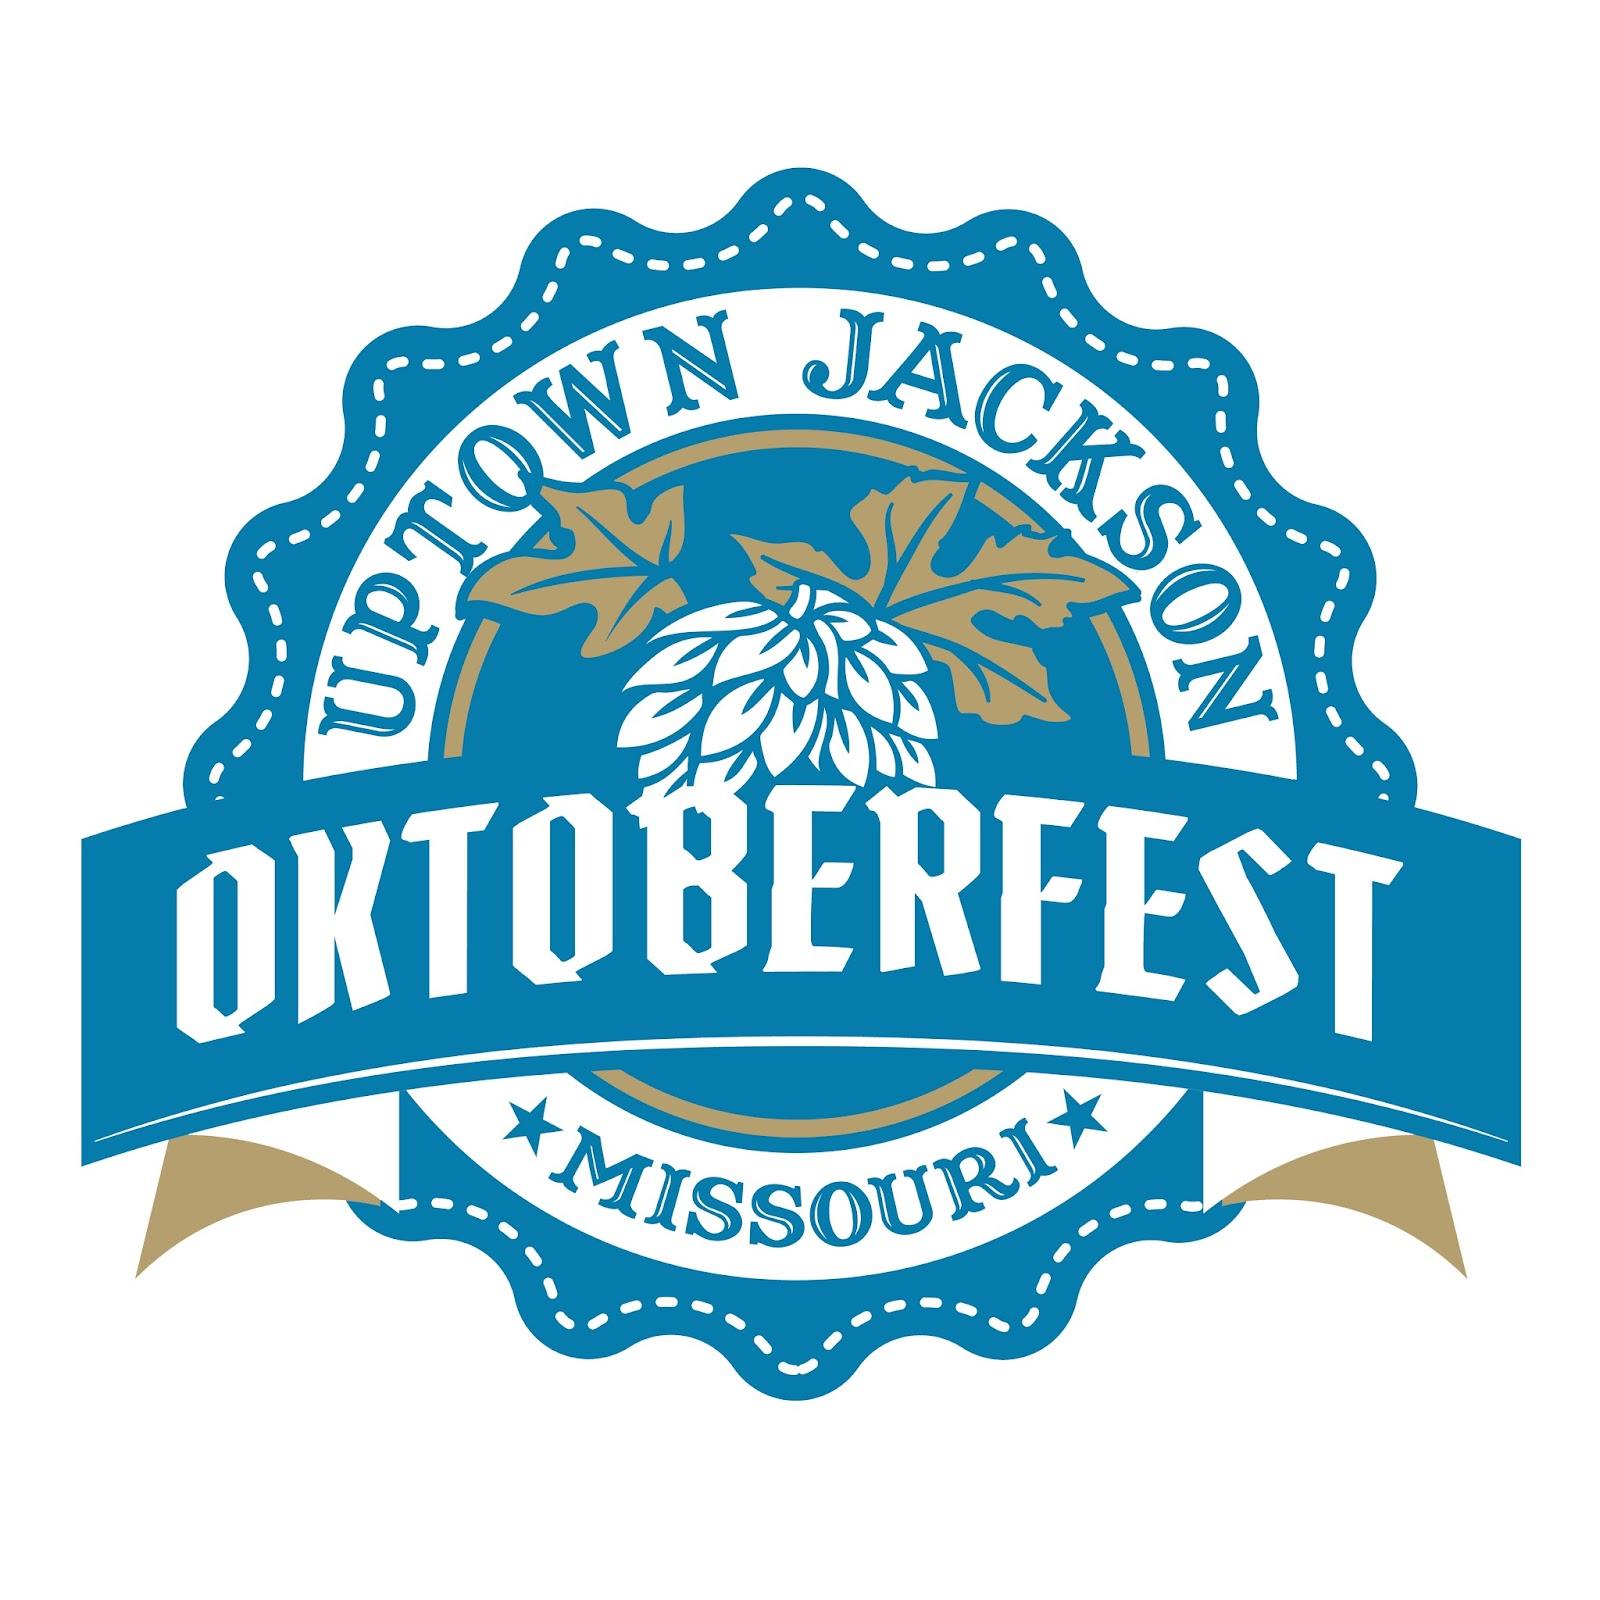 UJRO-Oktoberfest-main-logo-300dpi.jpg